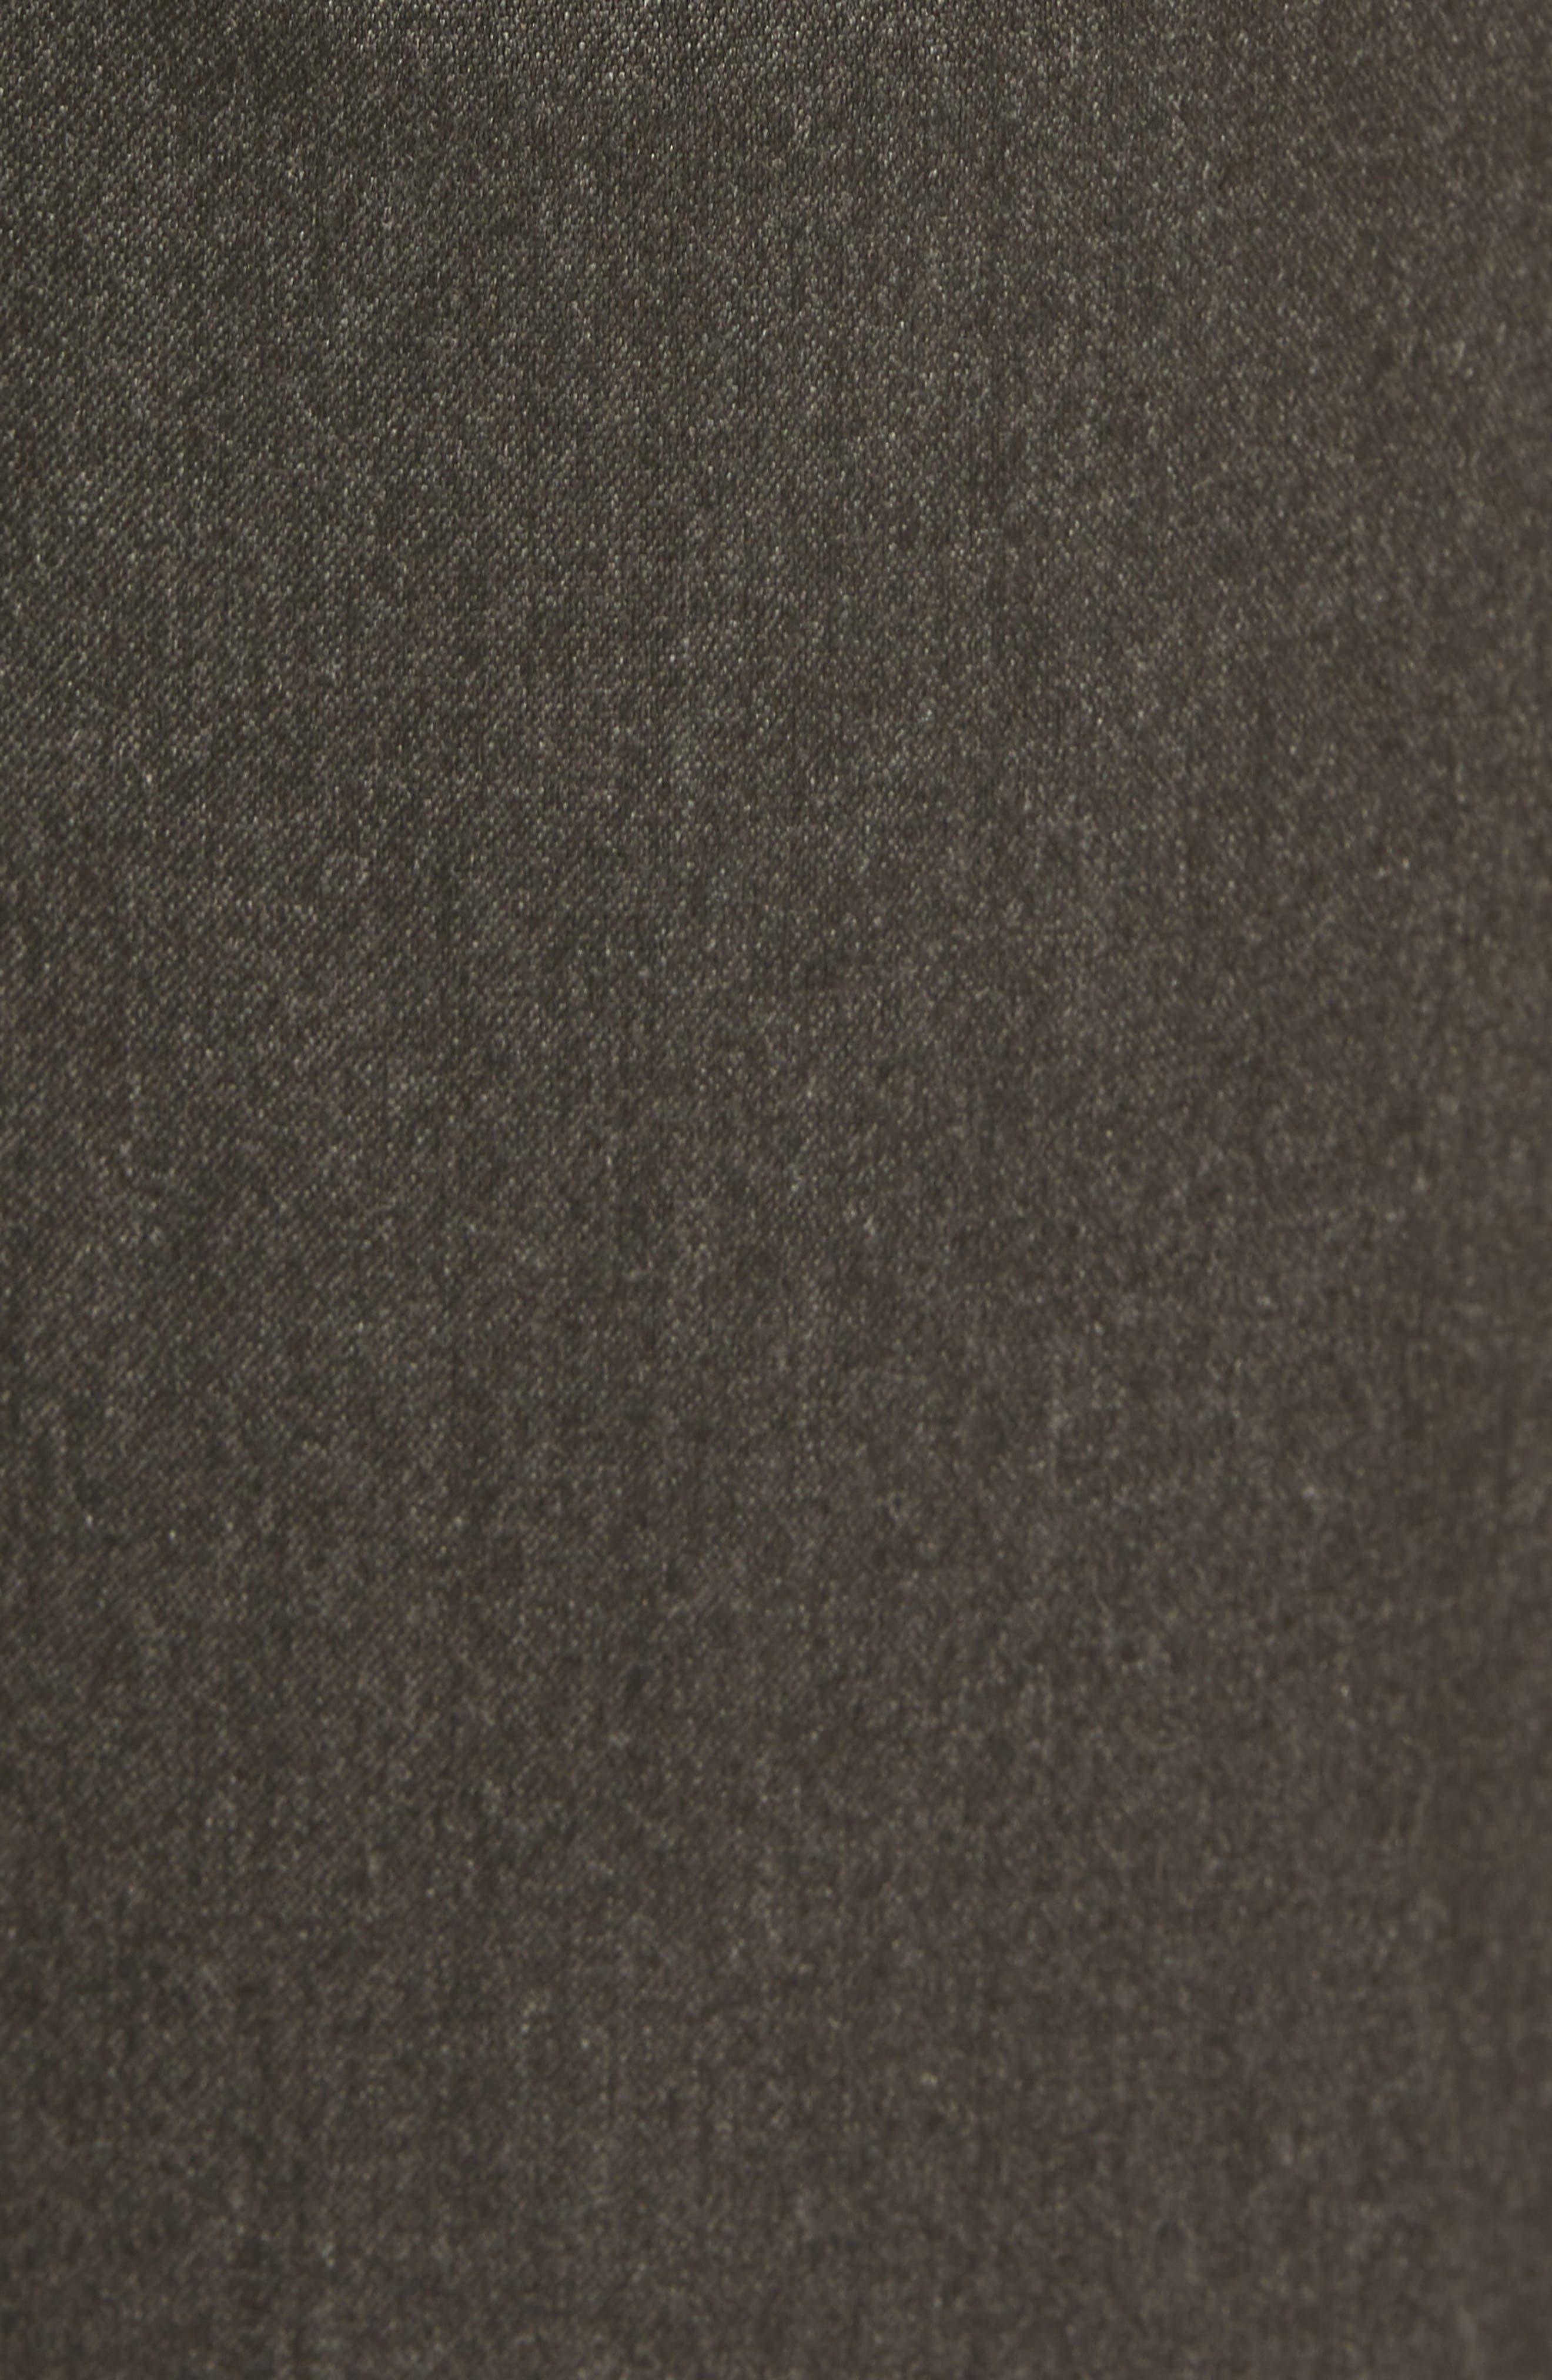 Champi Pleated Cropped Pants,                             Alternate thumbnail 5, color,                             Black